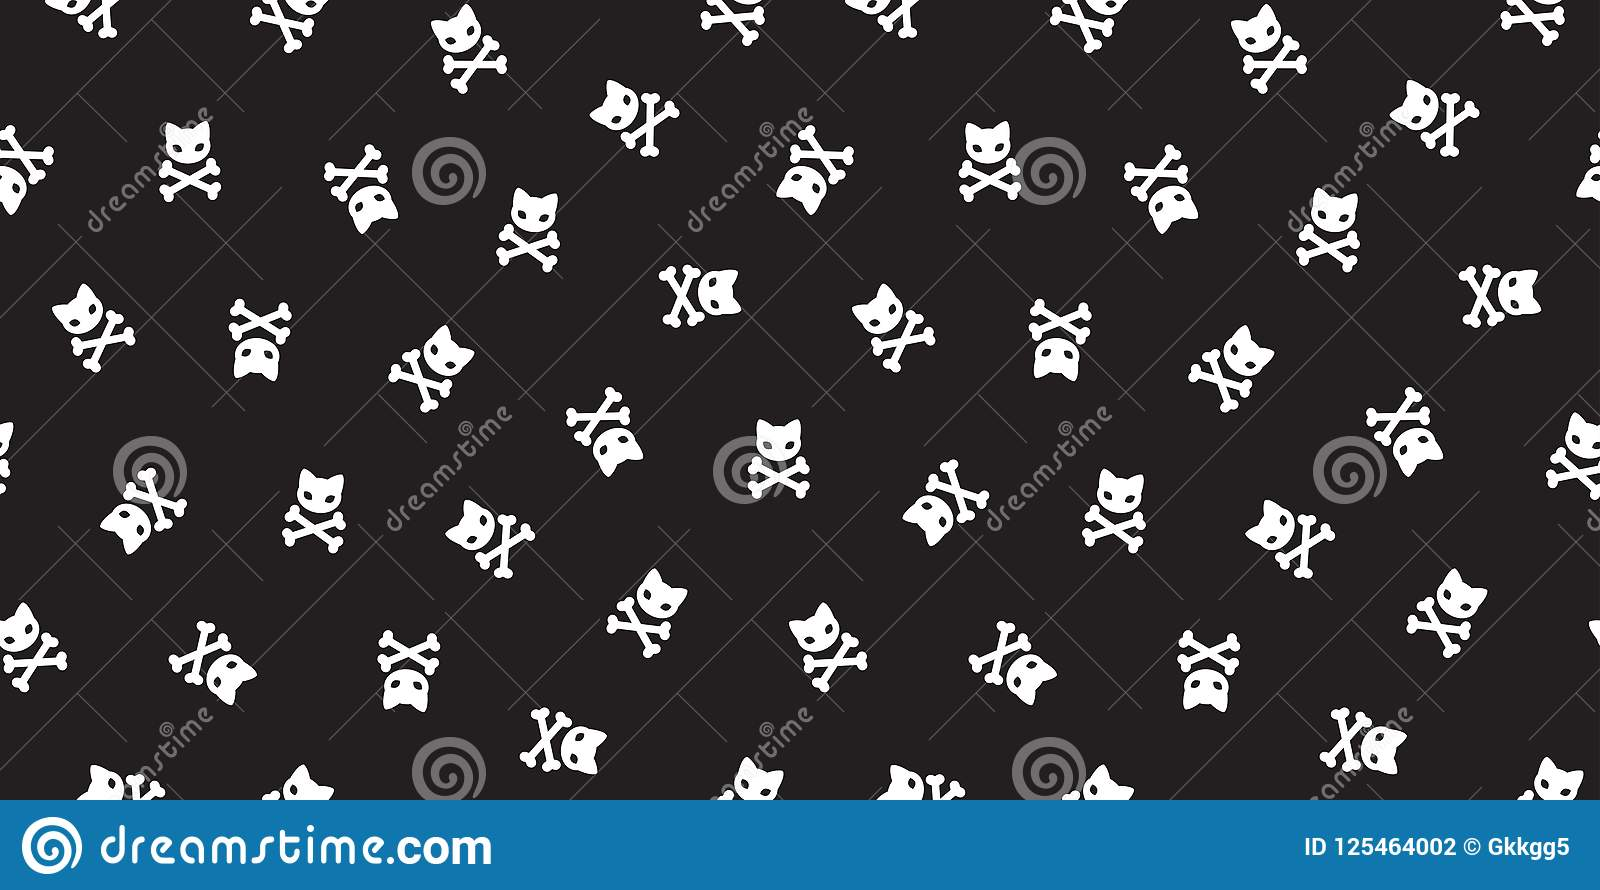 Pirate Crossbones Seamless Pattern Cat Kitten Halloween Pirate Black Wallpaper Background